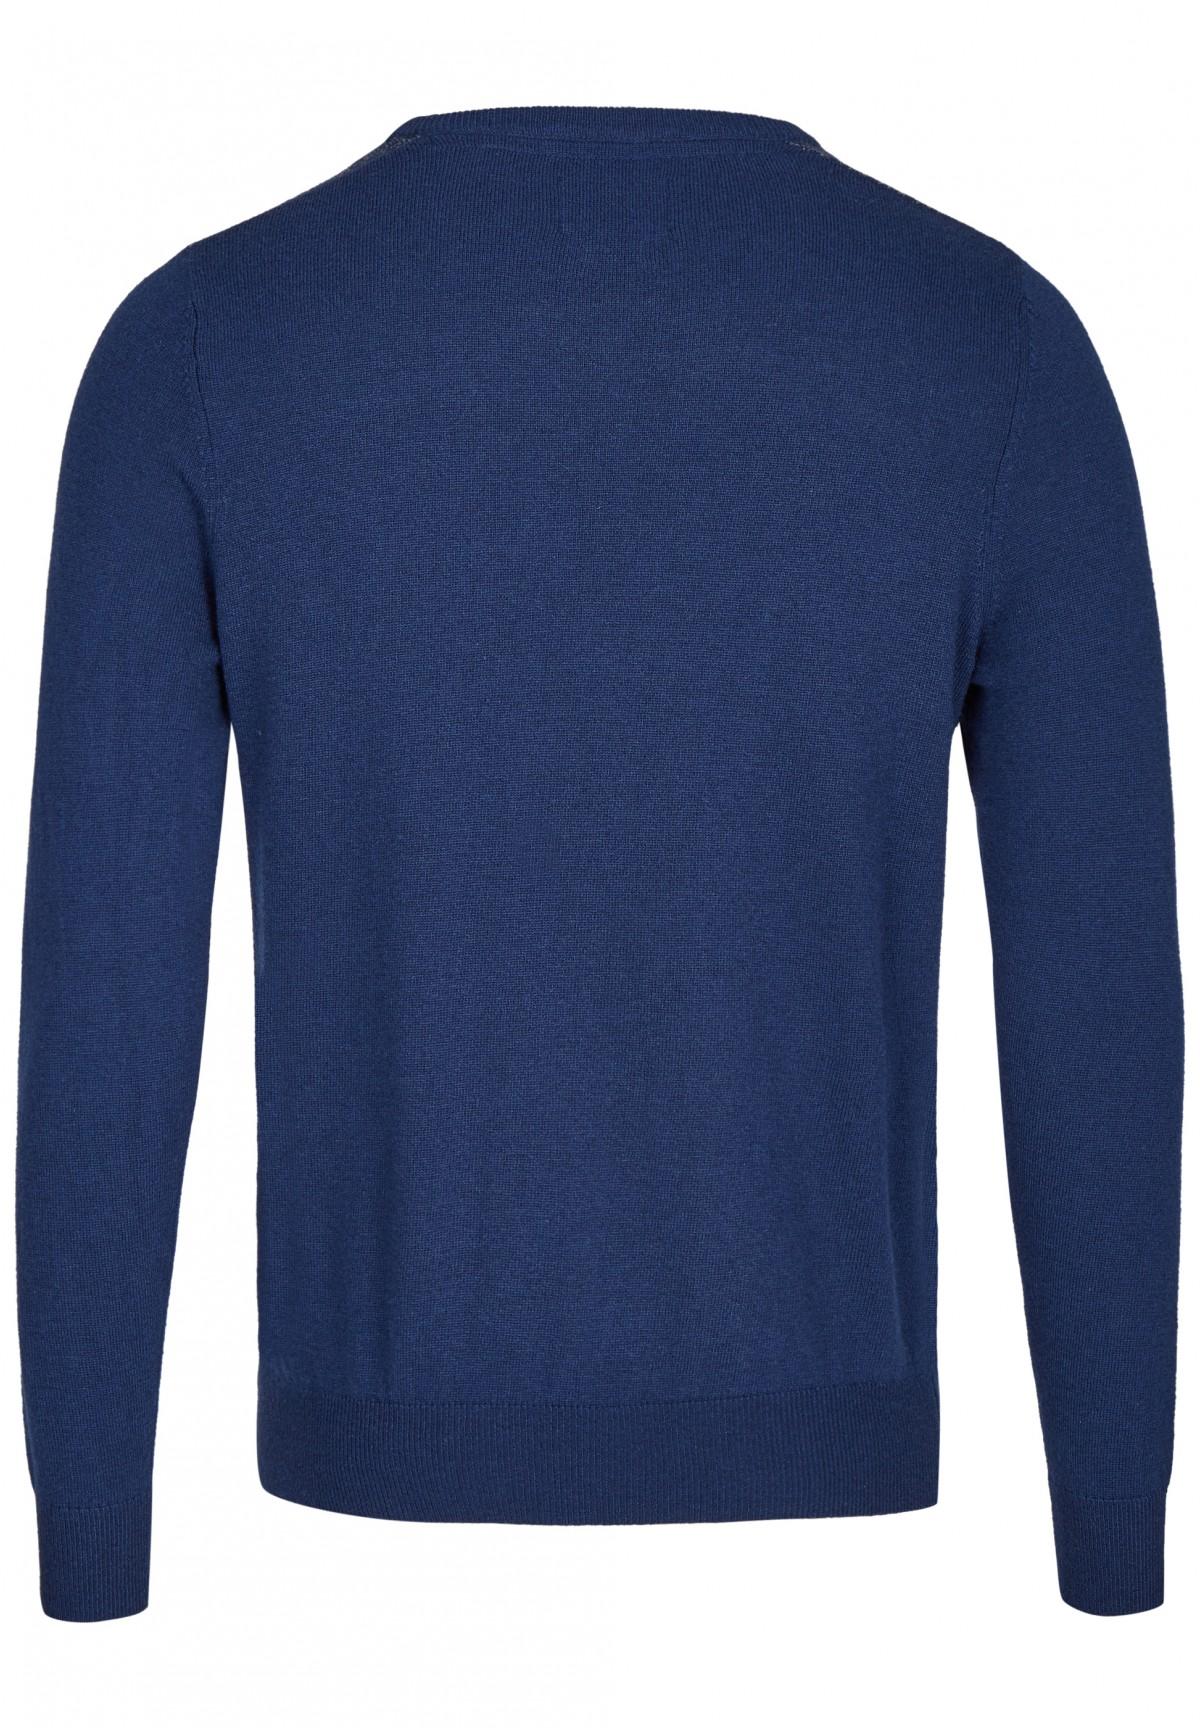 Pullover mit V-Ausschnitt / Pullover mit V-Ausschnitt